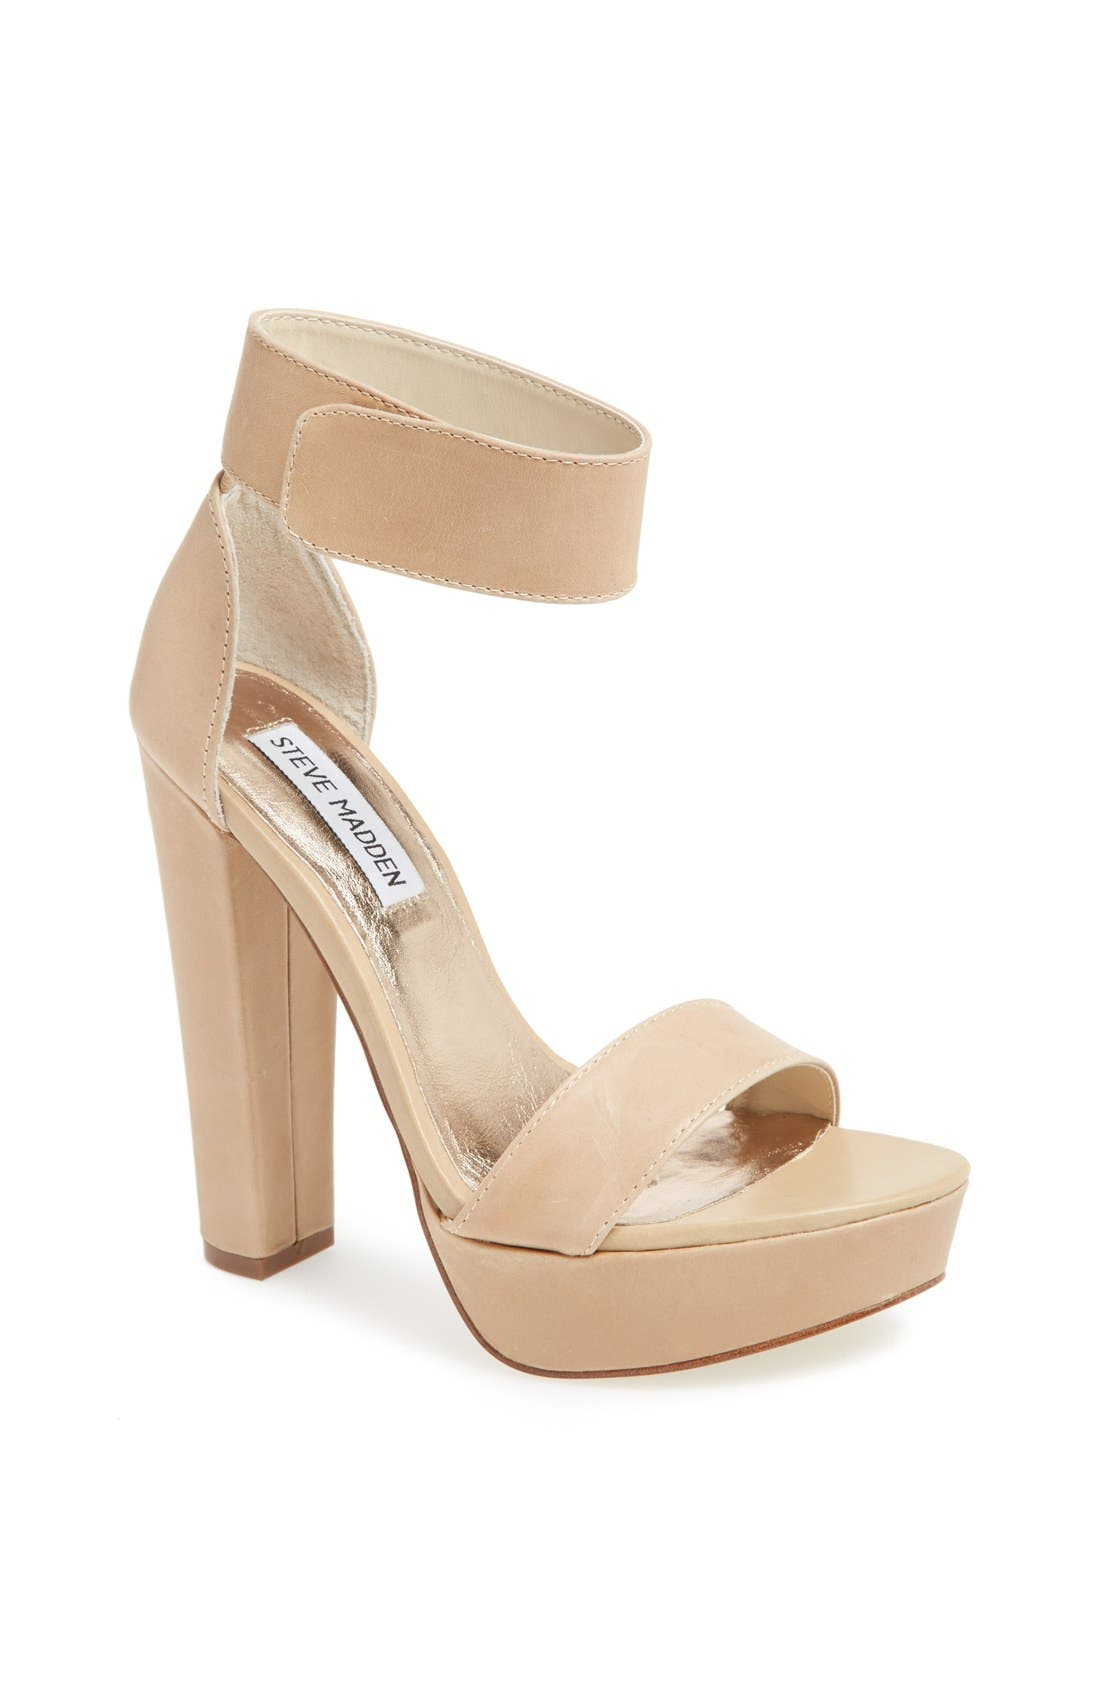 Main Image - Steve Madden 'Cluber' Platform Sandal